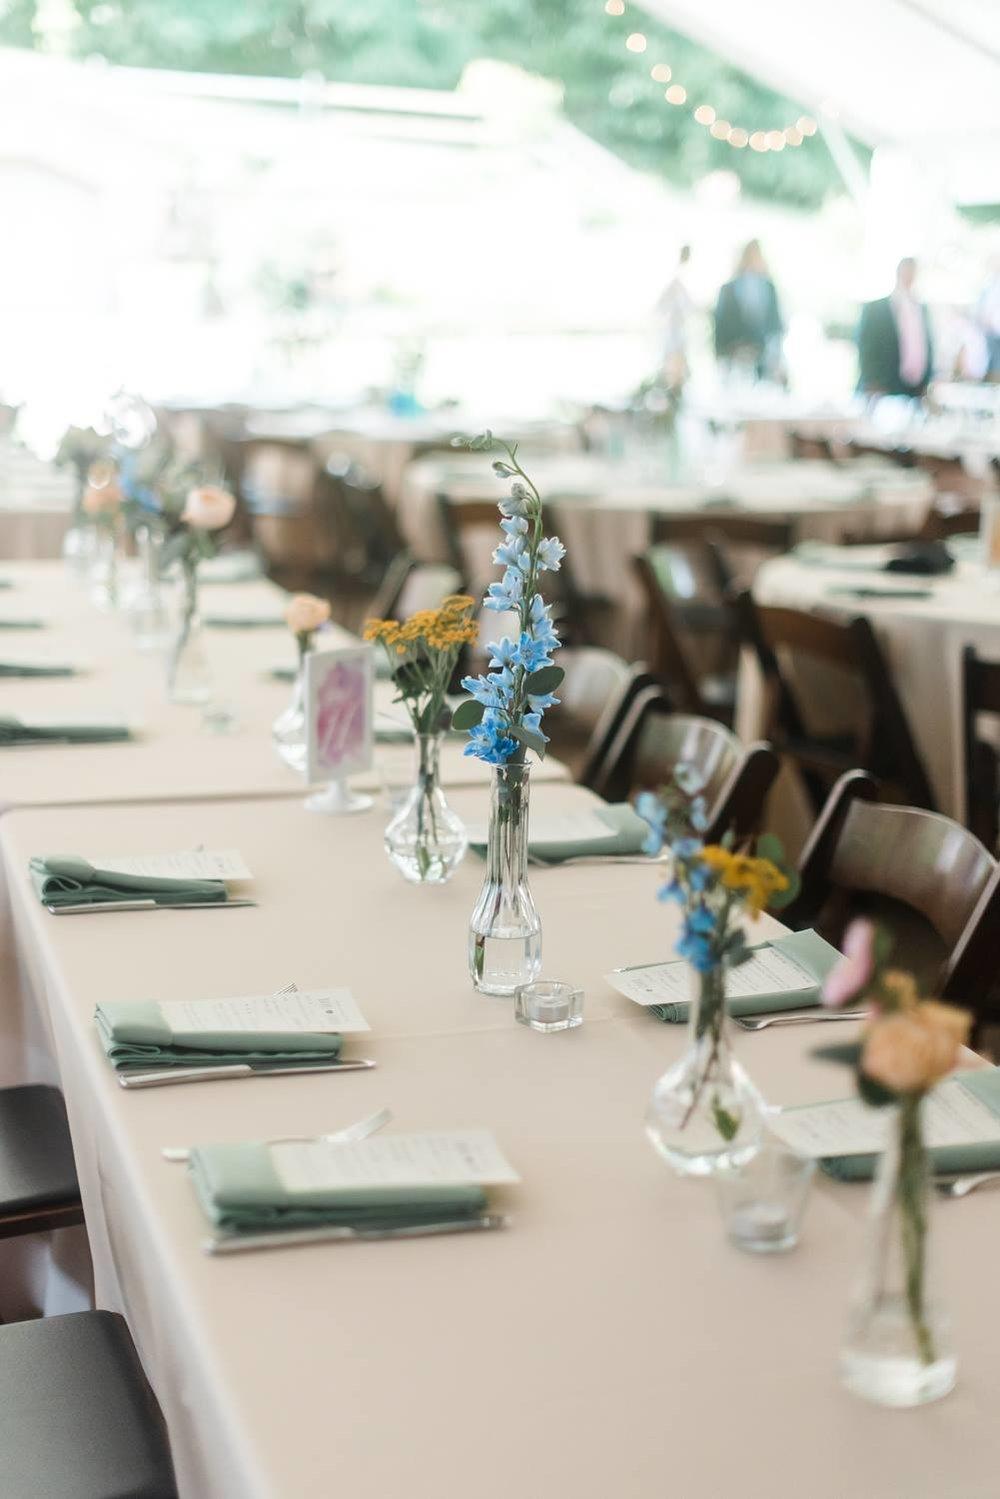 pittsburgh-botanic-garden-wedding-rustic-romantic-pennsylvania-0029.jpg